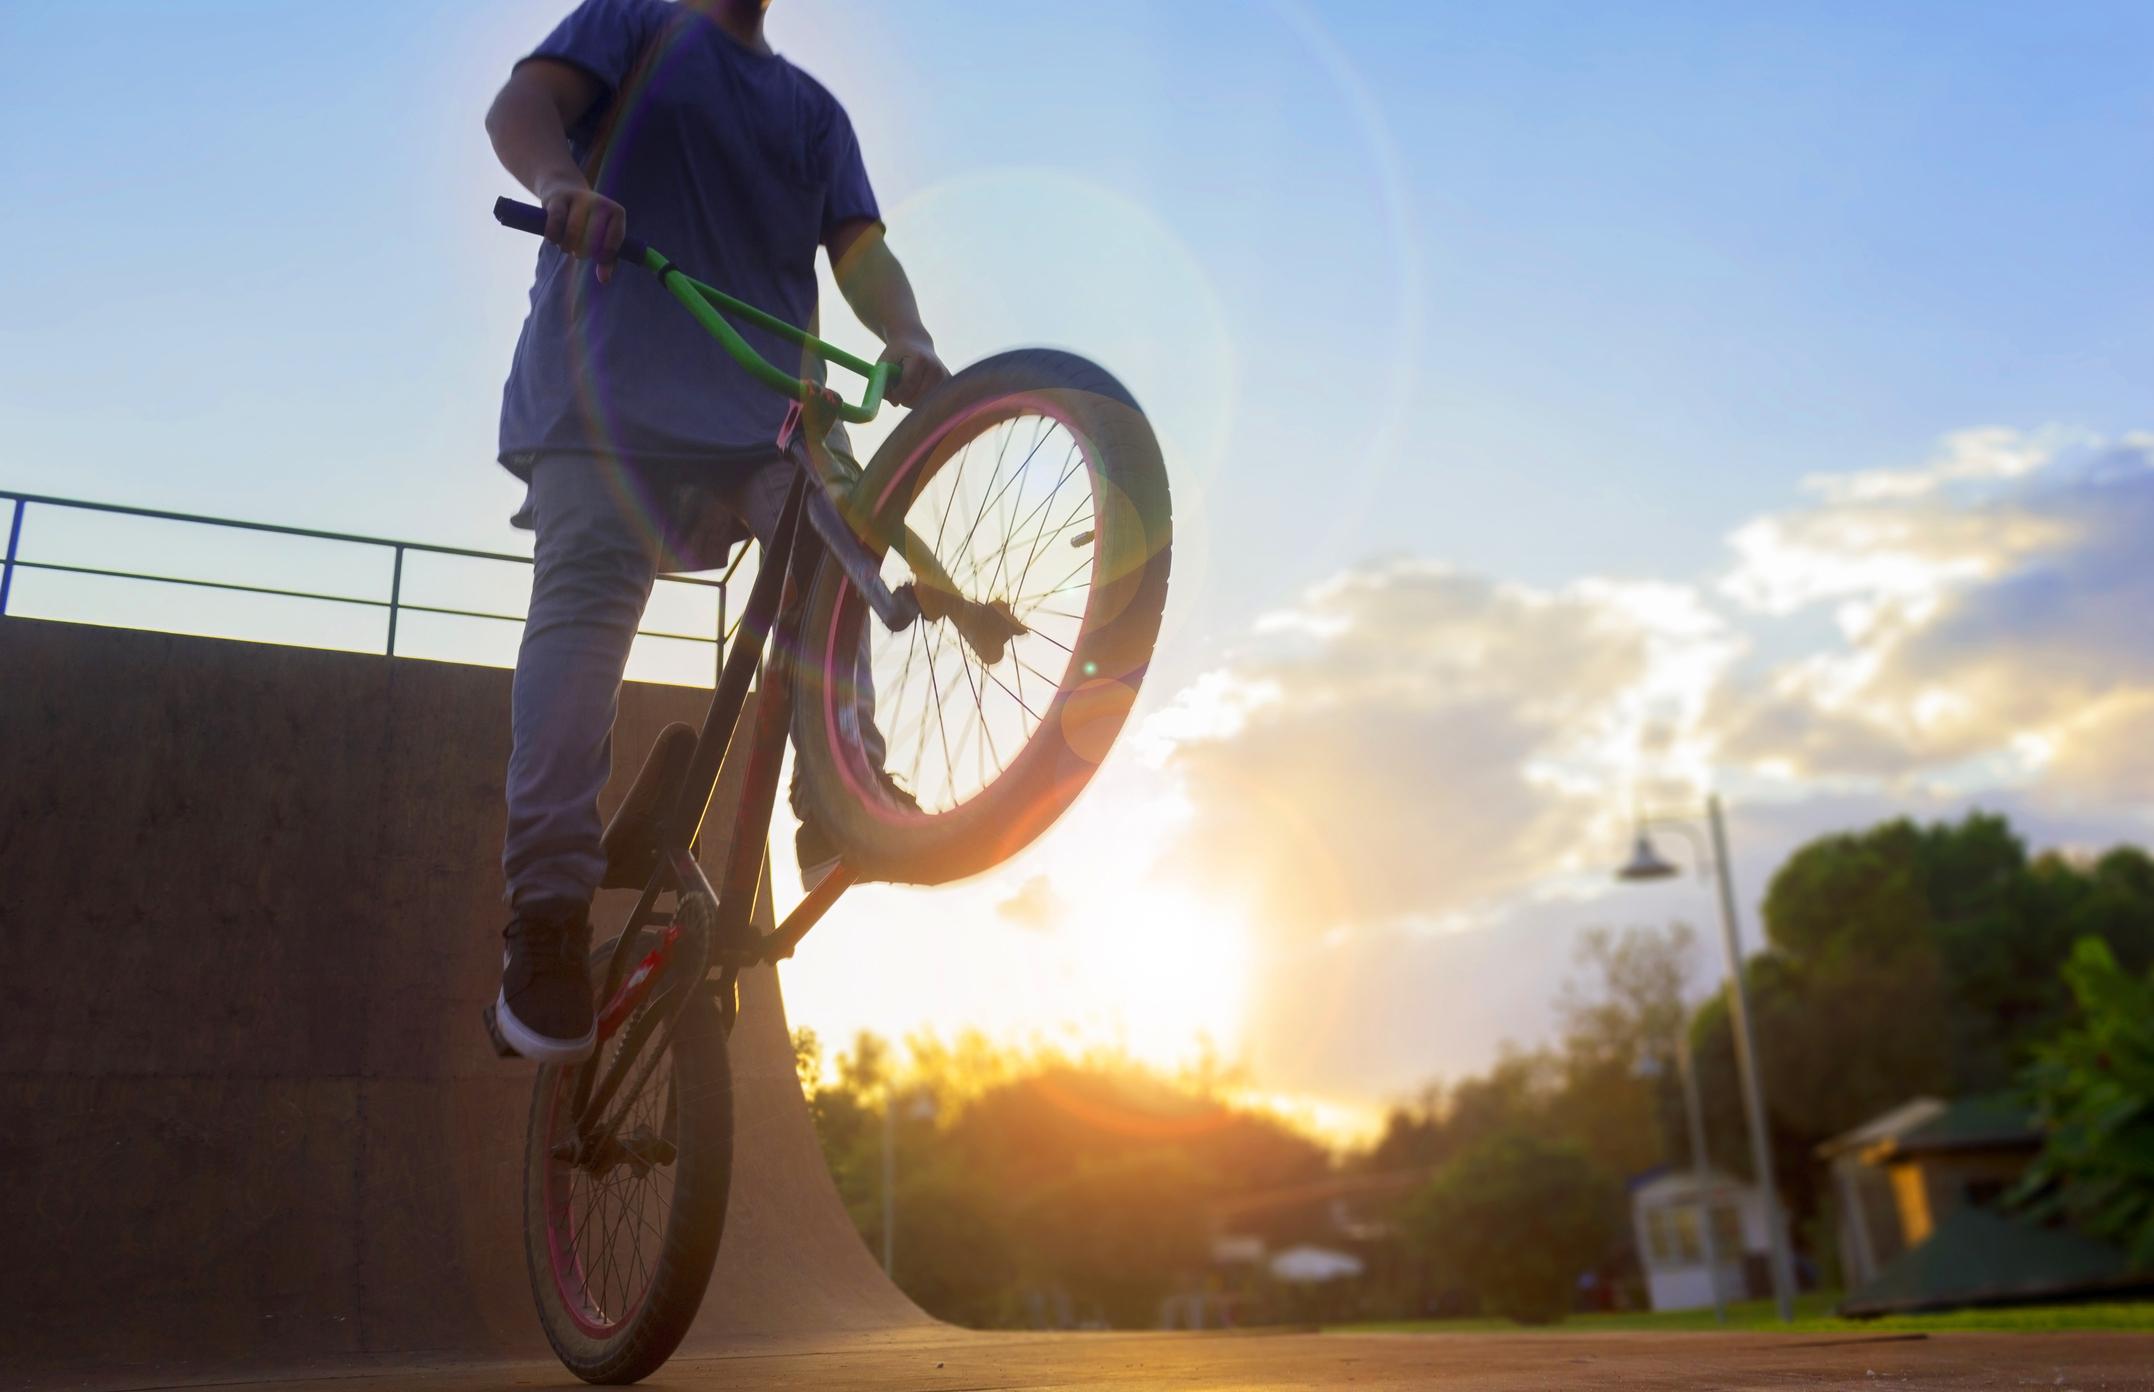 BMX bike rider jumping with bike on bicycle ramp